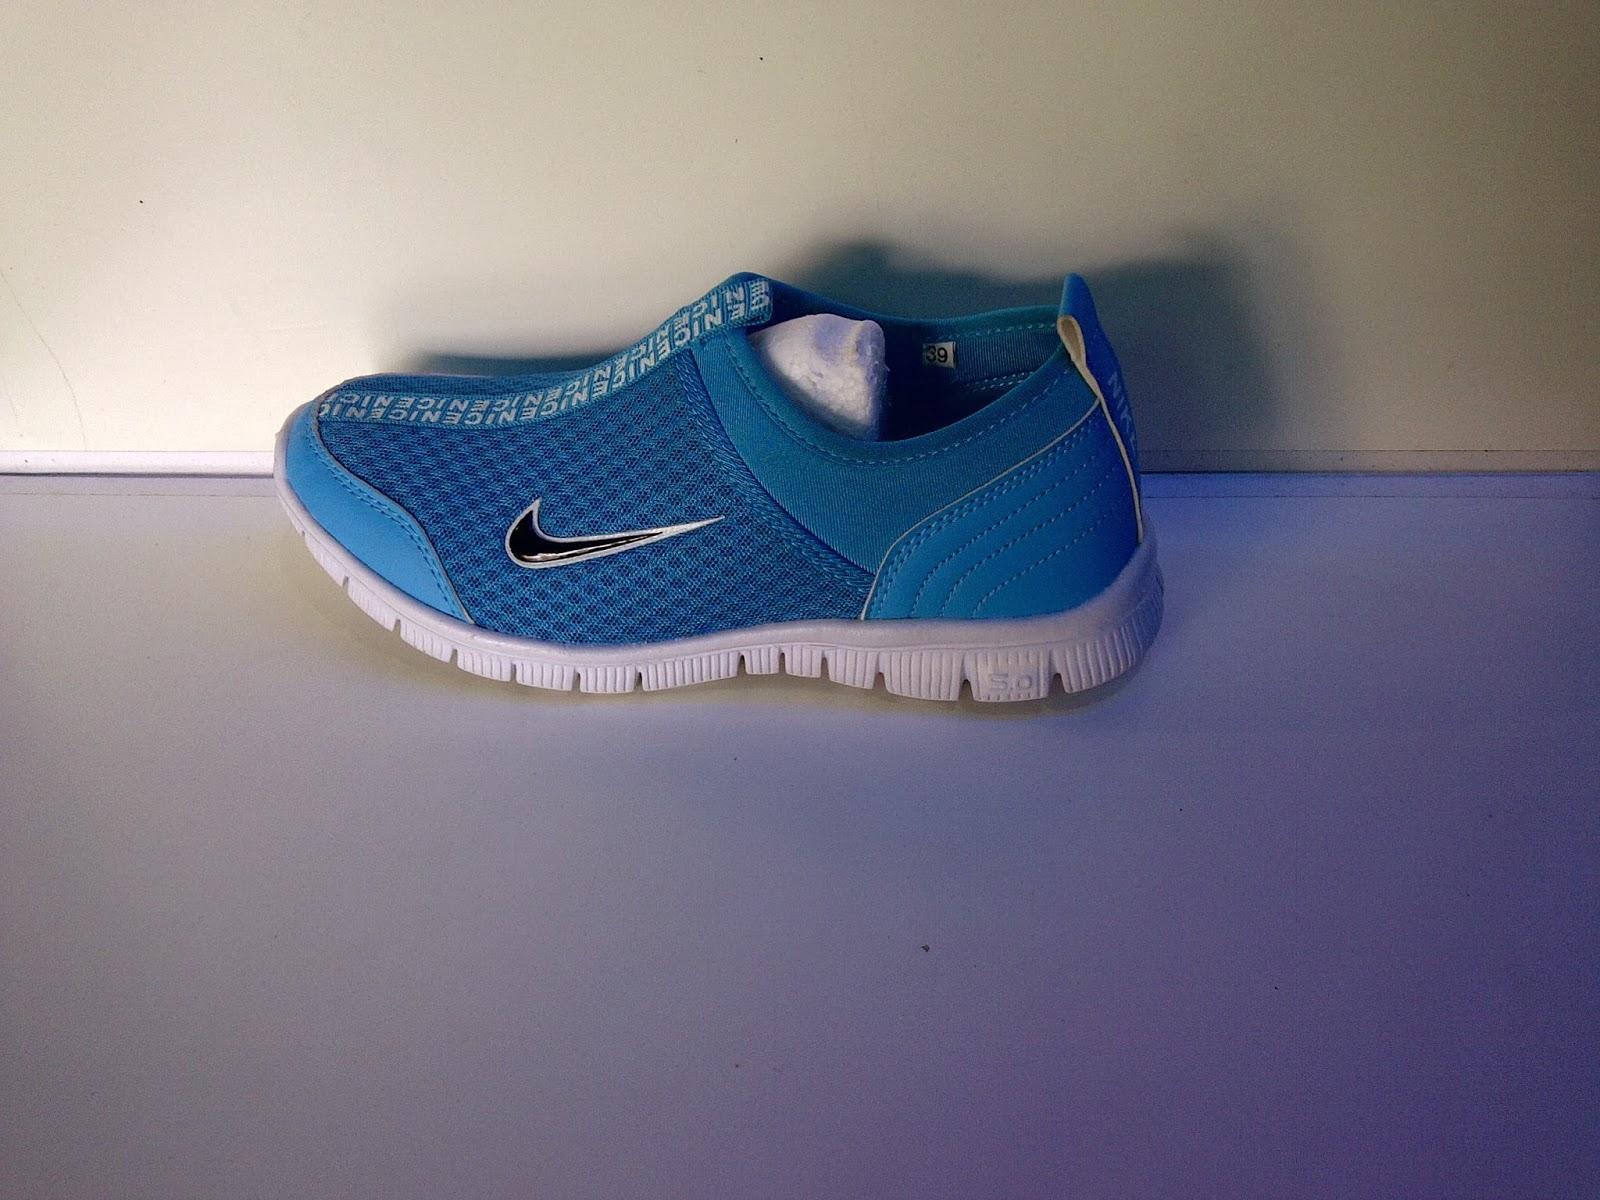 sepatu online slop,online sepatu wanita,sepatu wanita slop,toko sepatu slop wanita,